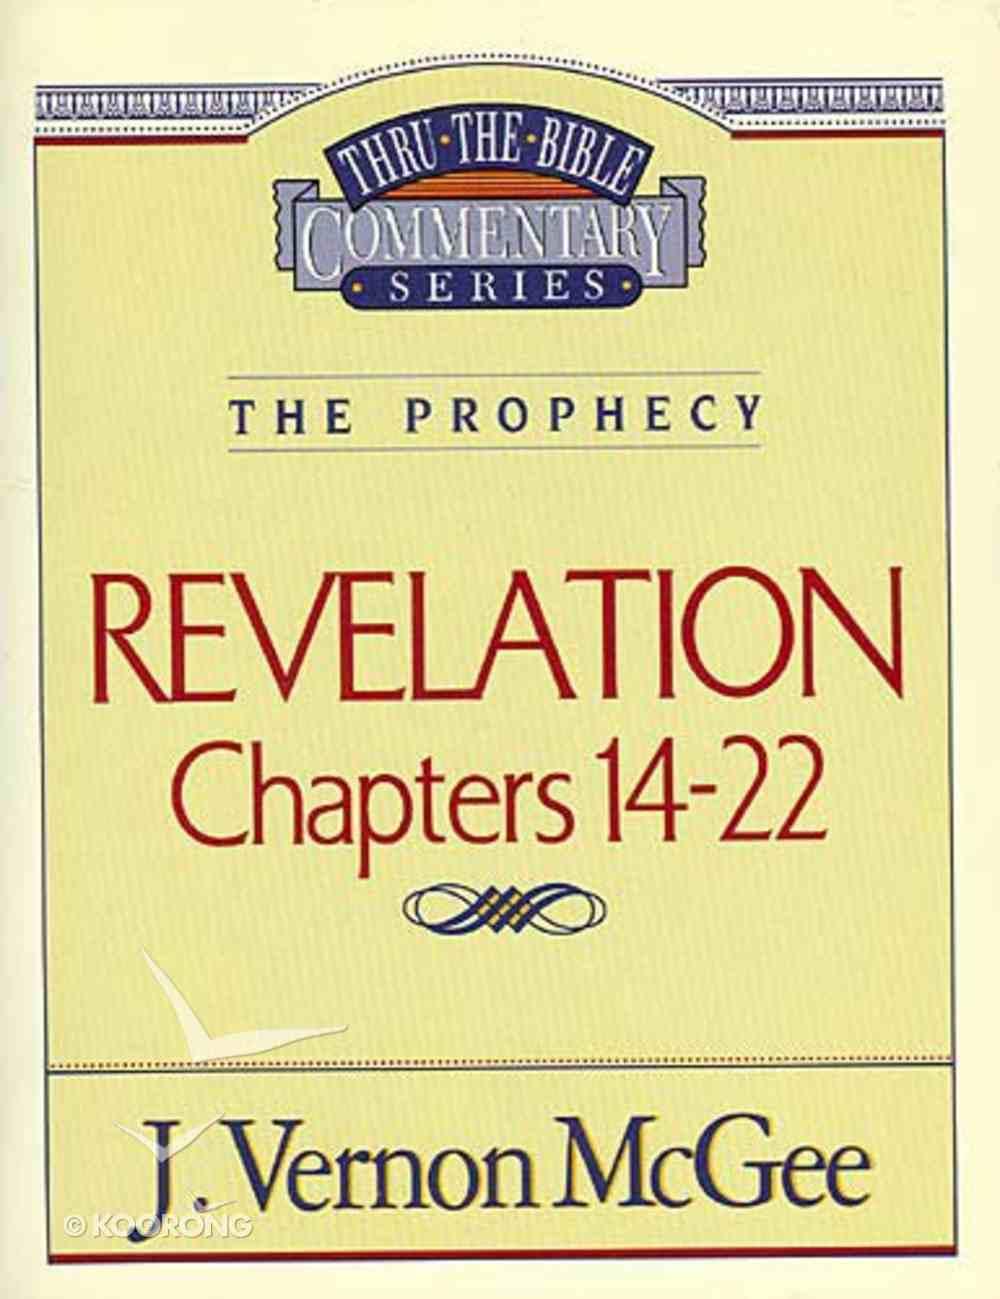 Thru the Bible NT #60: Revelation (Volume 3) (#60 in Thru The Bible New Testament Series) Paperback